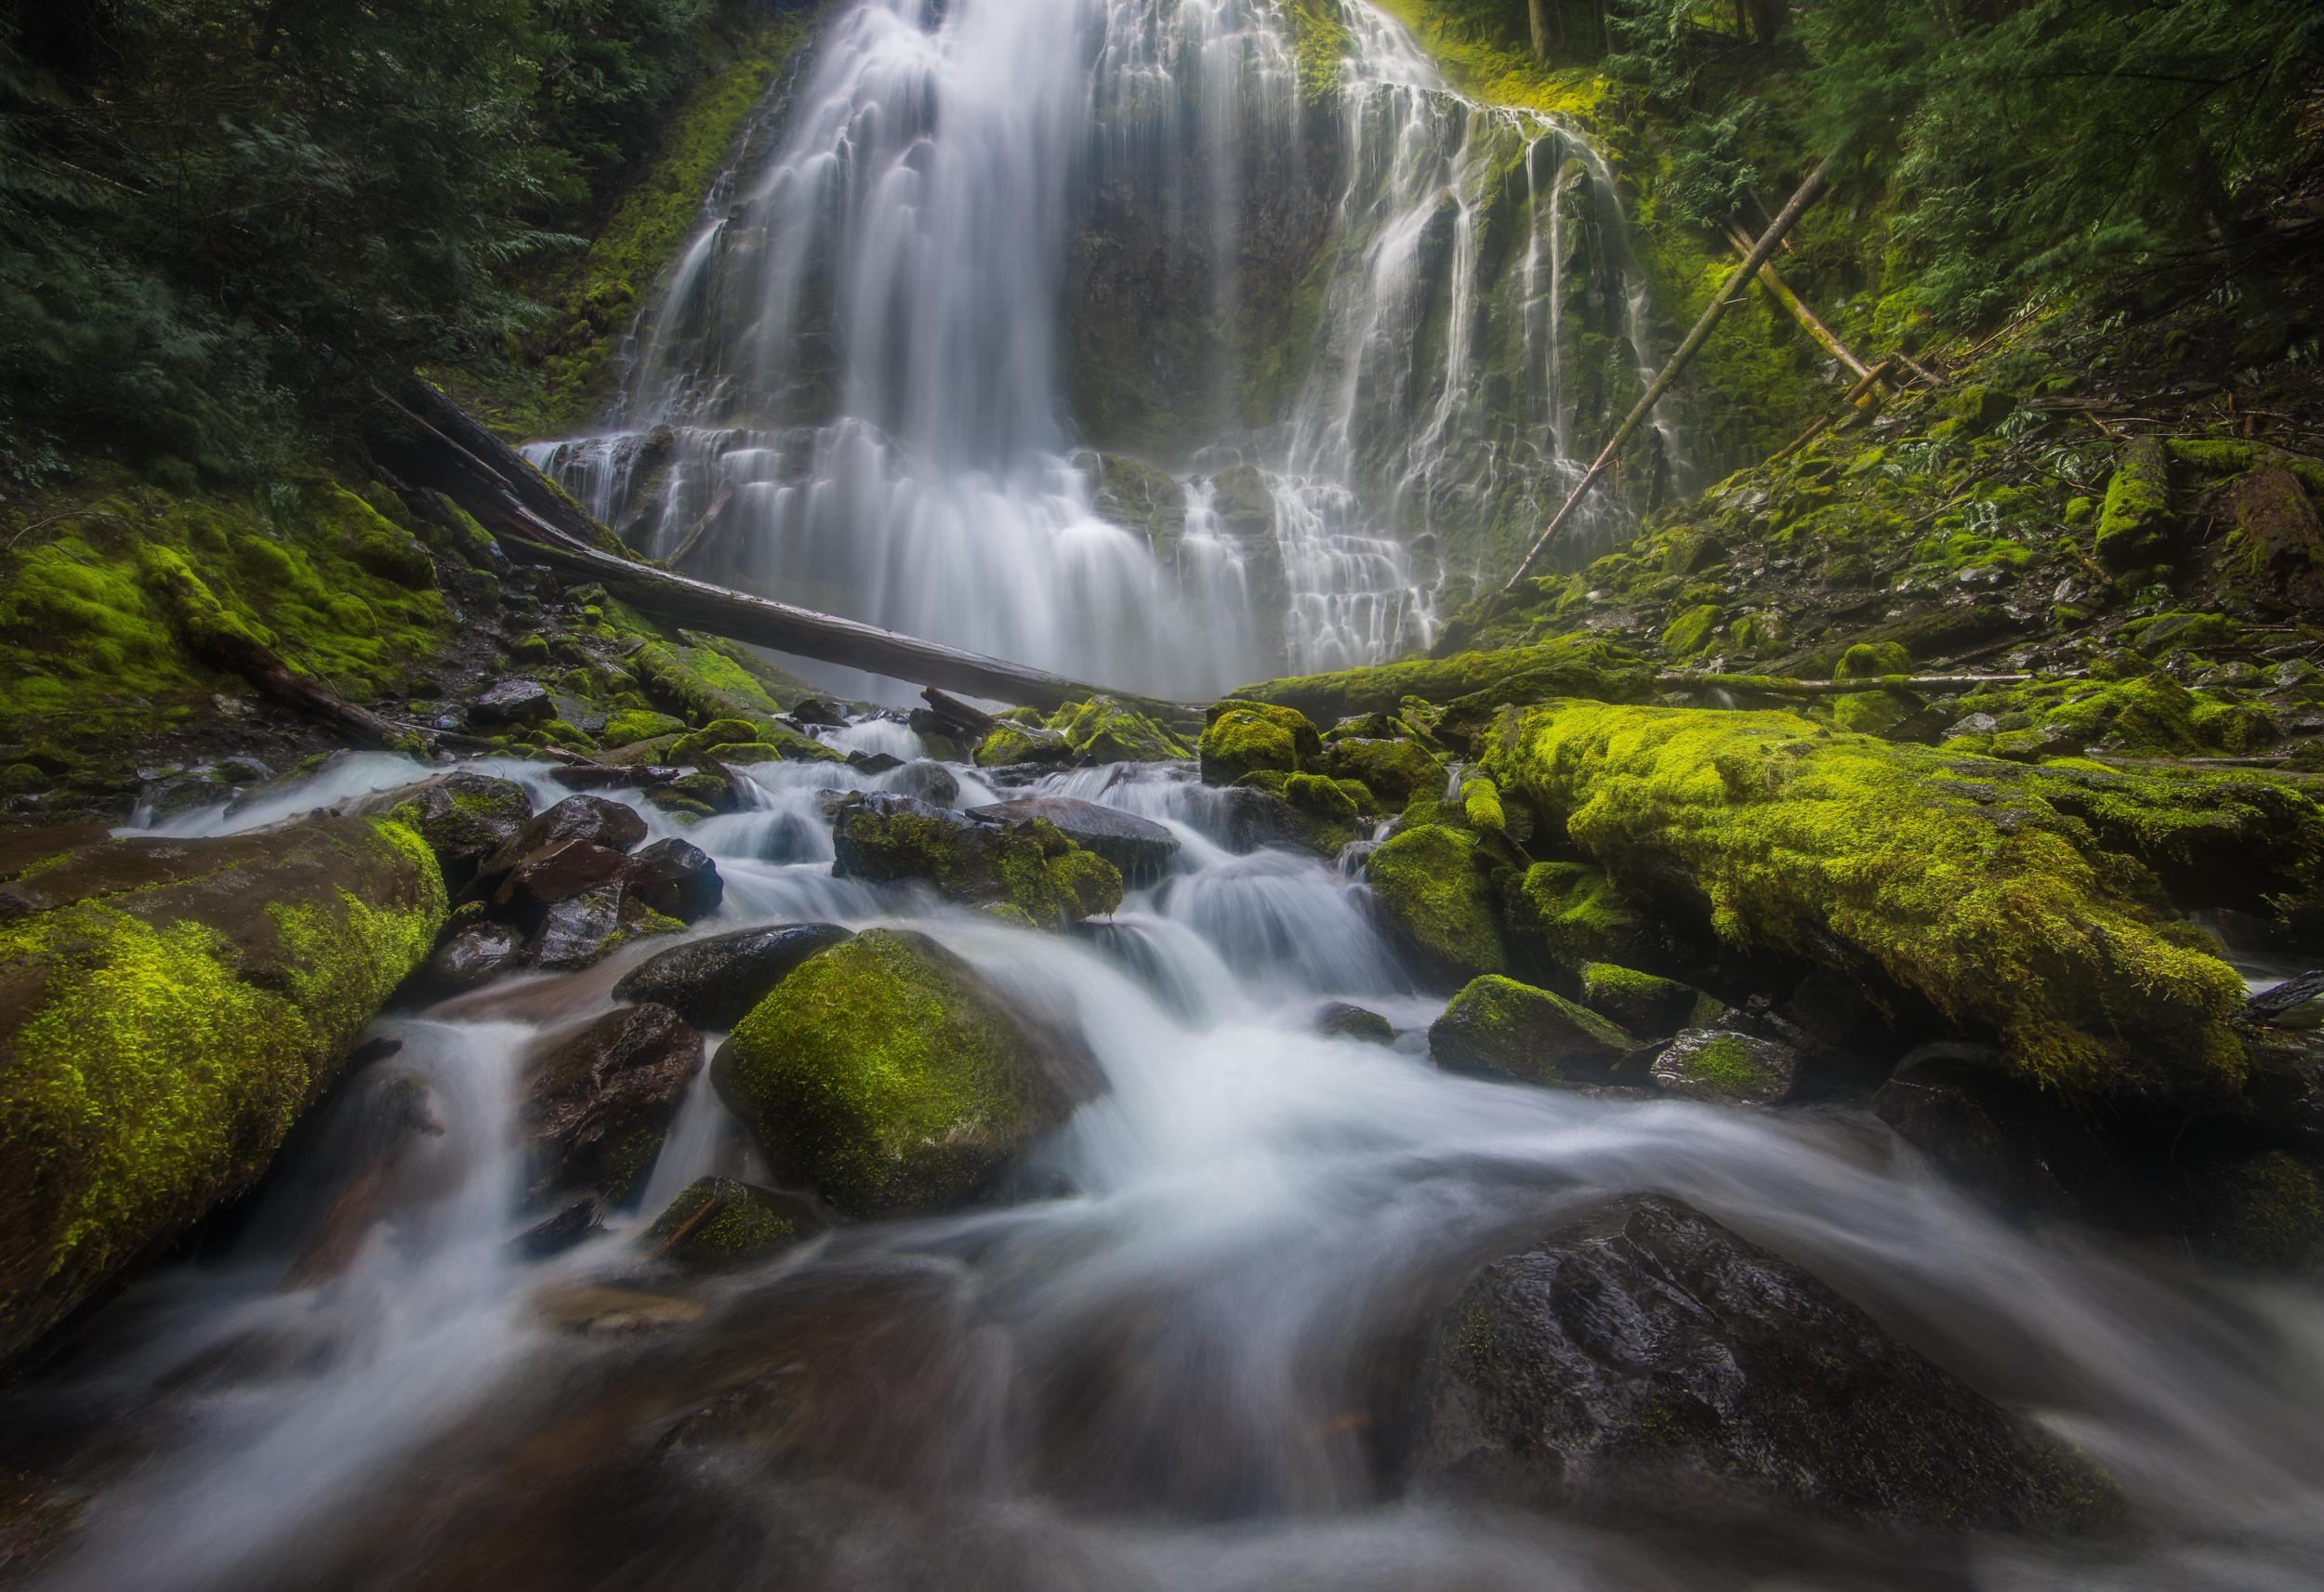 Oregon_042817._CVB9555-Edit.JPG